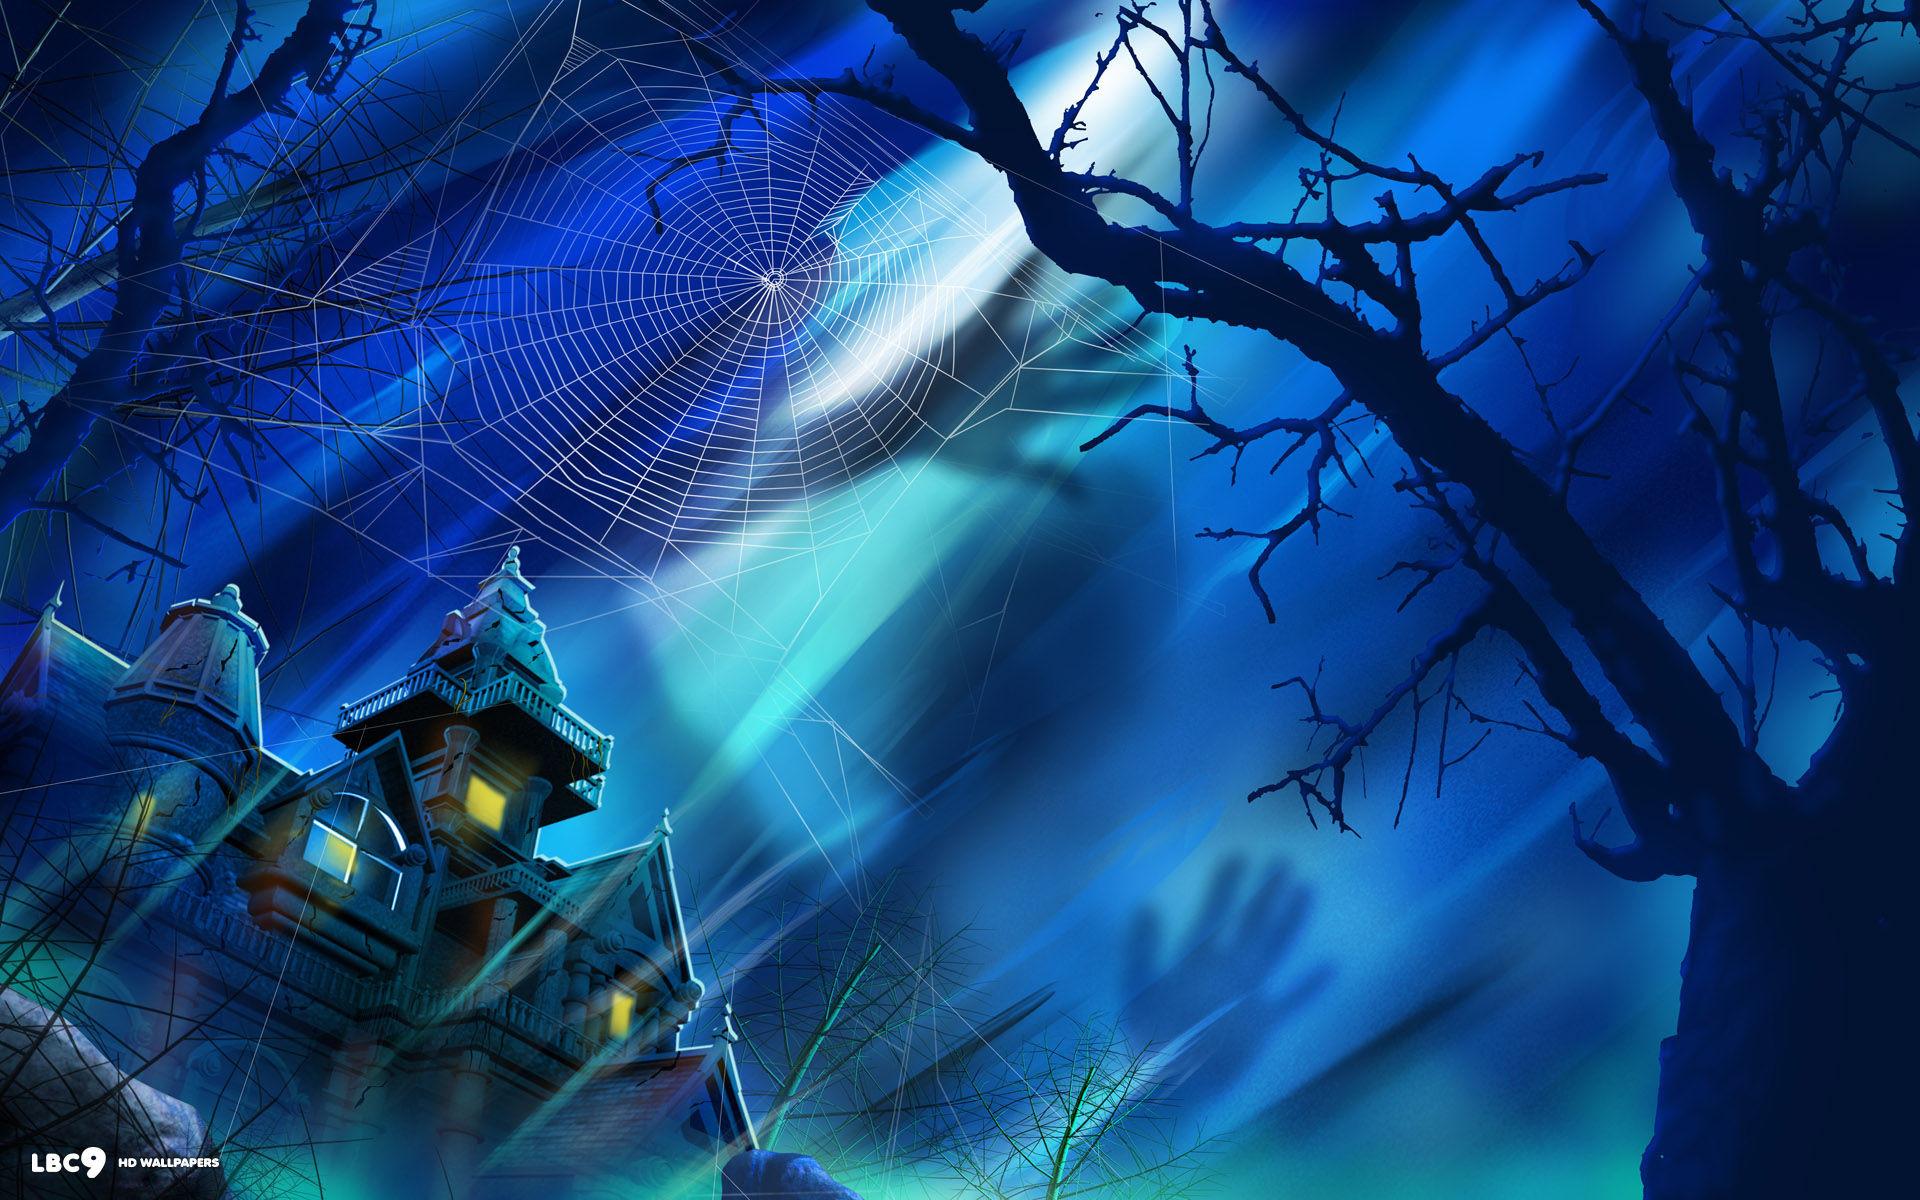 halloween house spider web tree shadow moonlight holiday desktop wallpaper